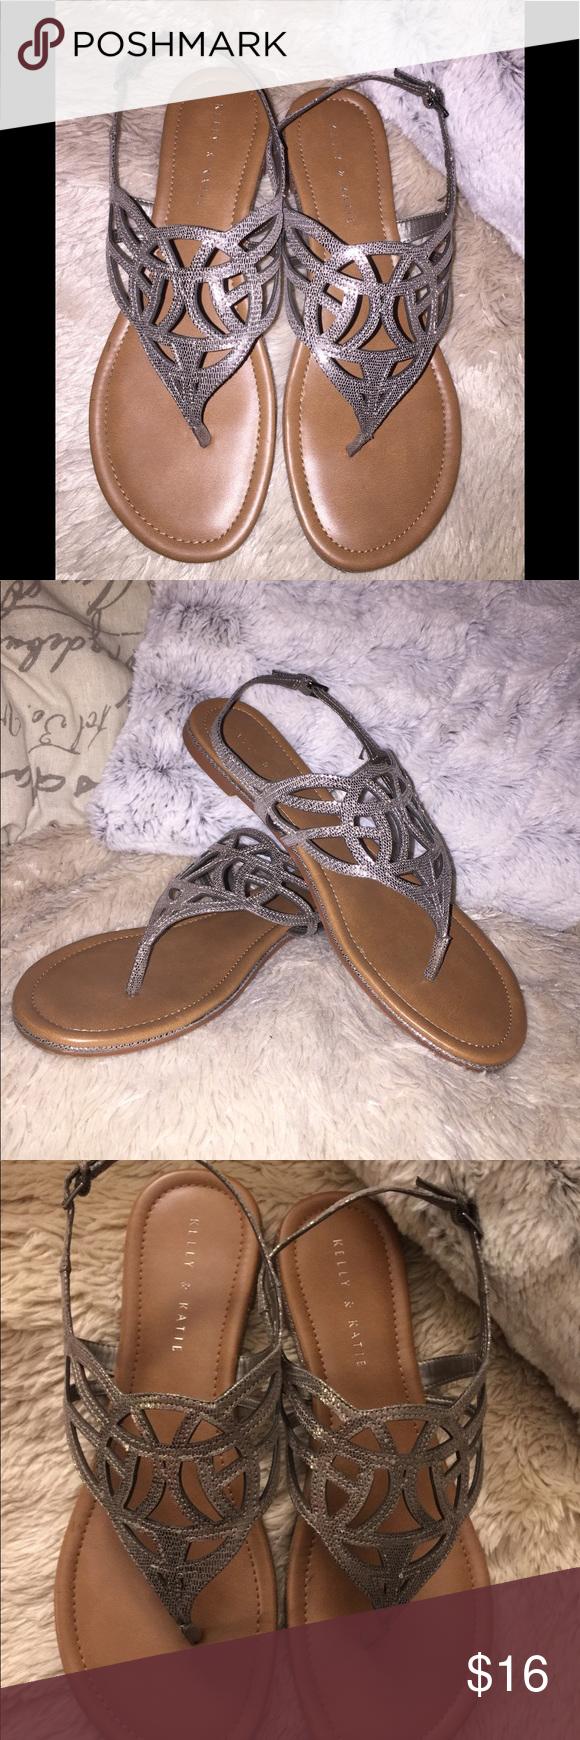 5ffc5bbdb7b8 Kelly   Katie Silver Sandal Pewter metallic flat Patrice sandal. Worn once.  Kelly   Katie Shoes Sandals